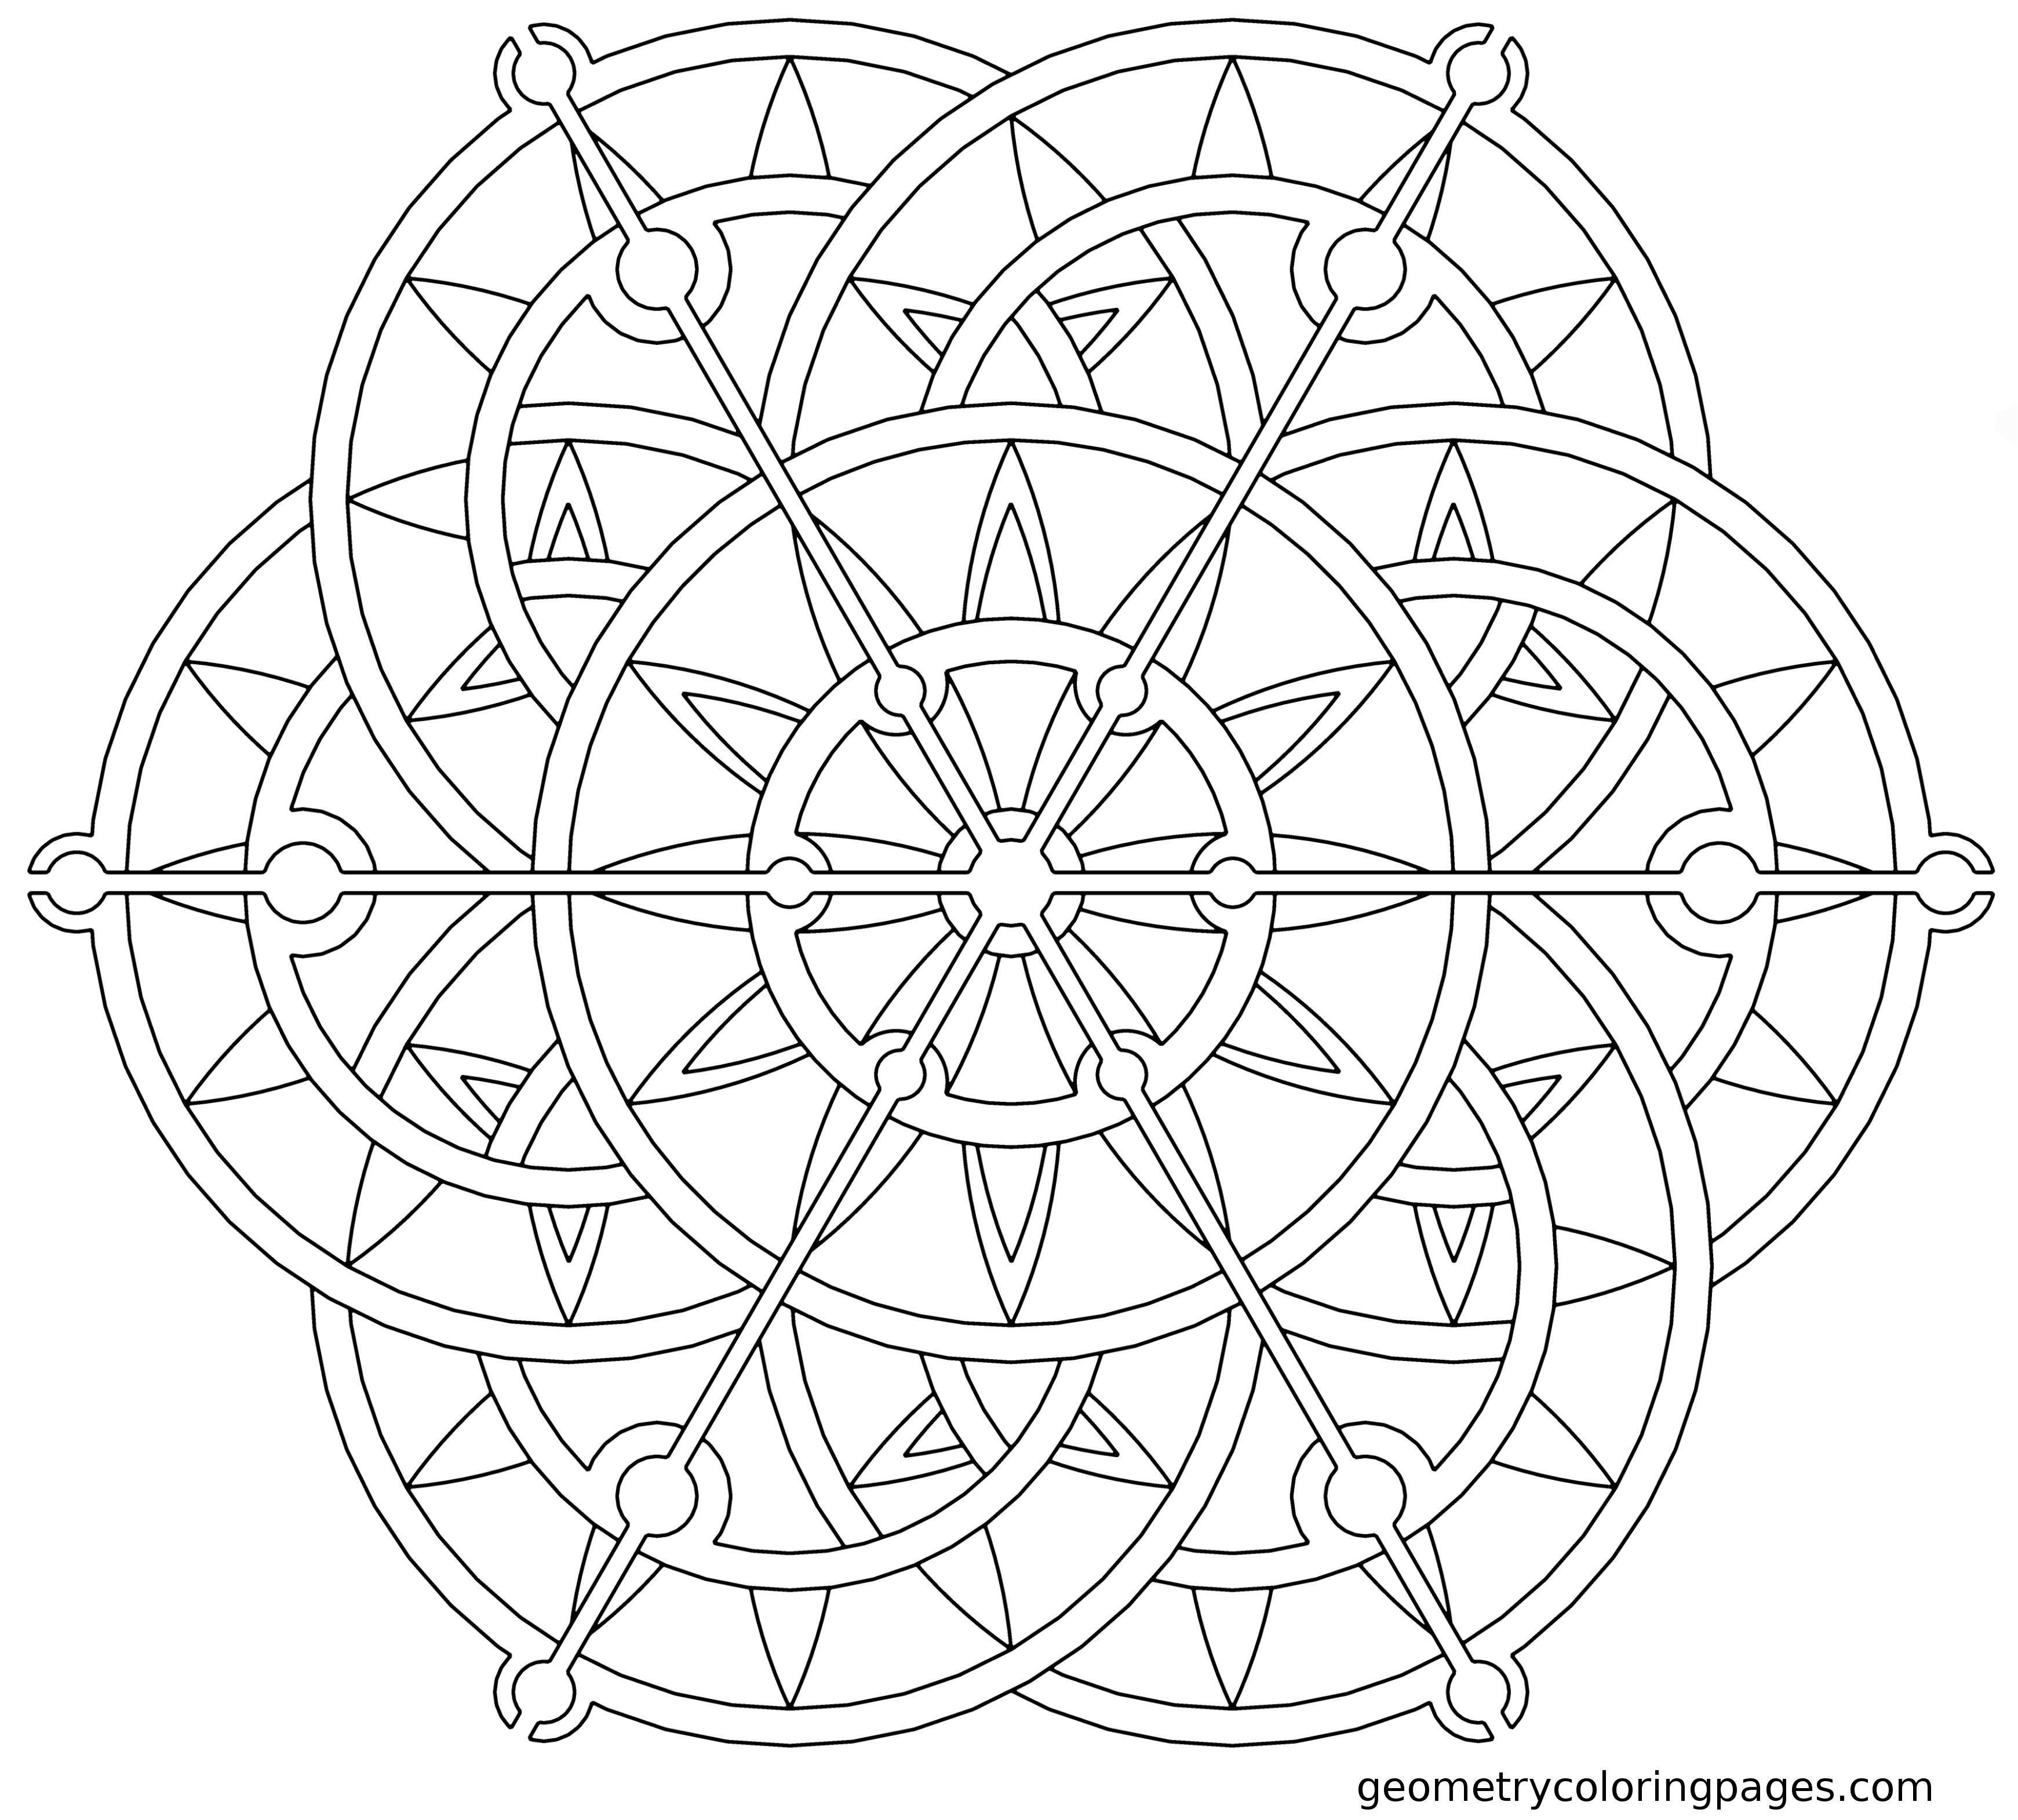 Mandala Coloring Page Steampunk Lotus from